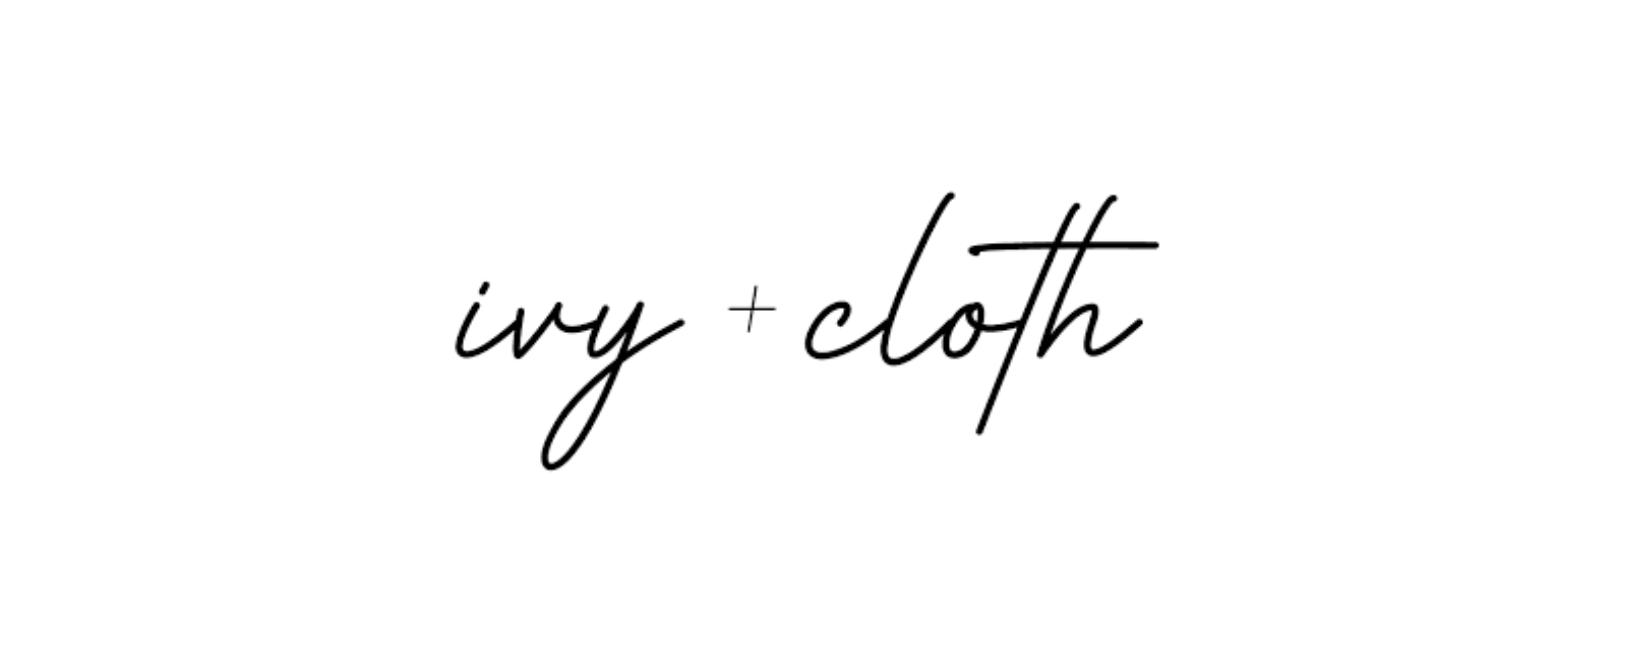 Ivy + Cloth Discount Code 2021